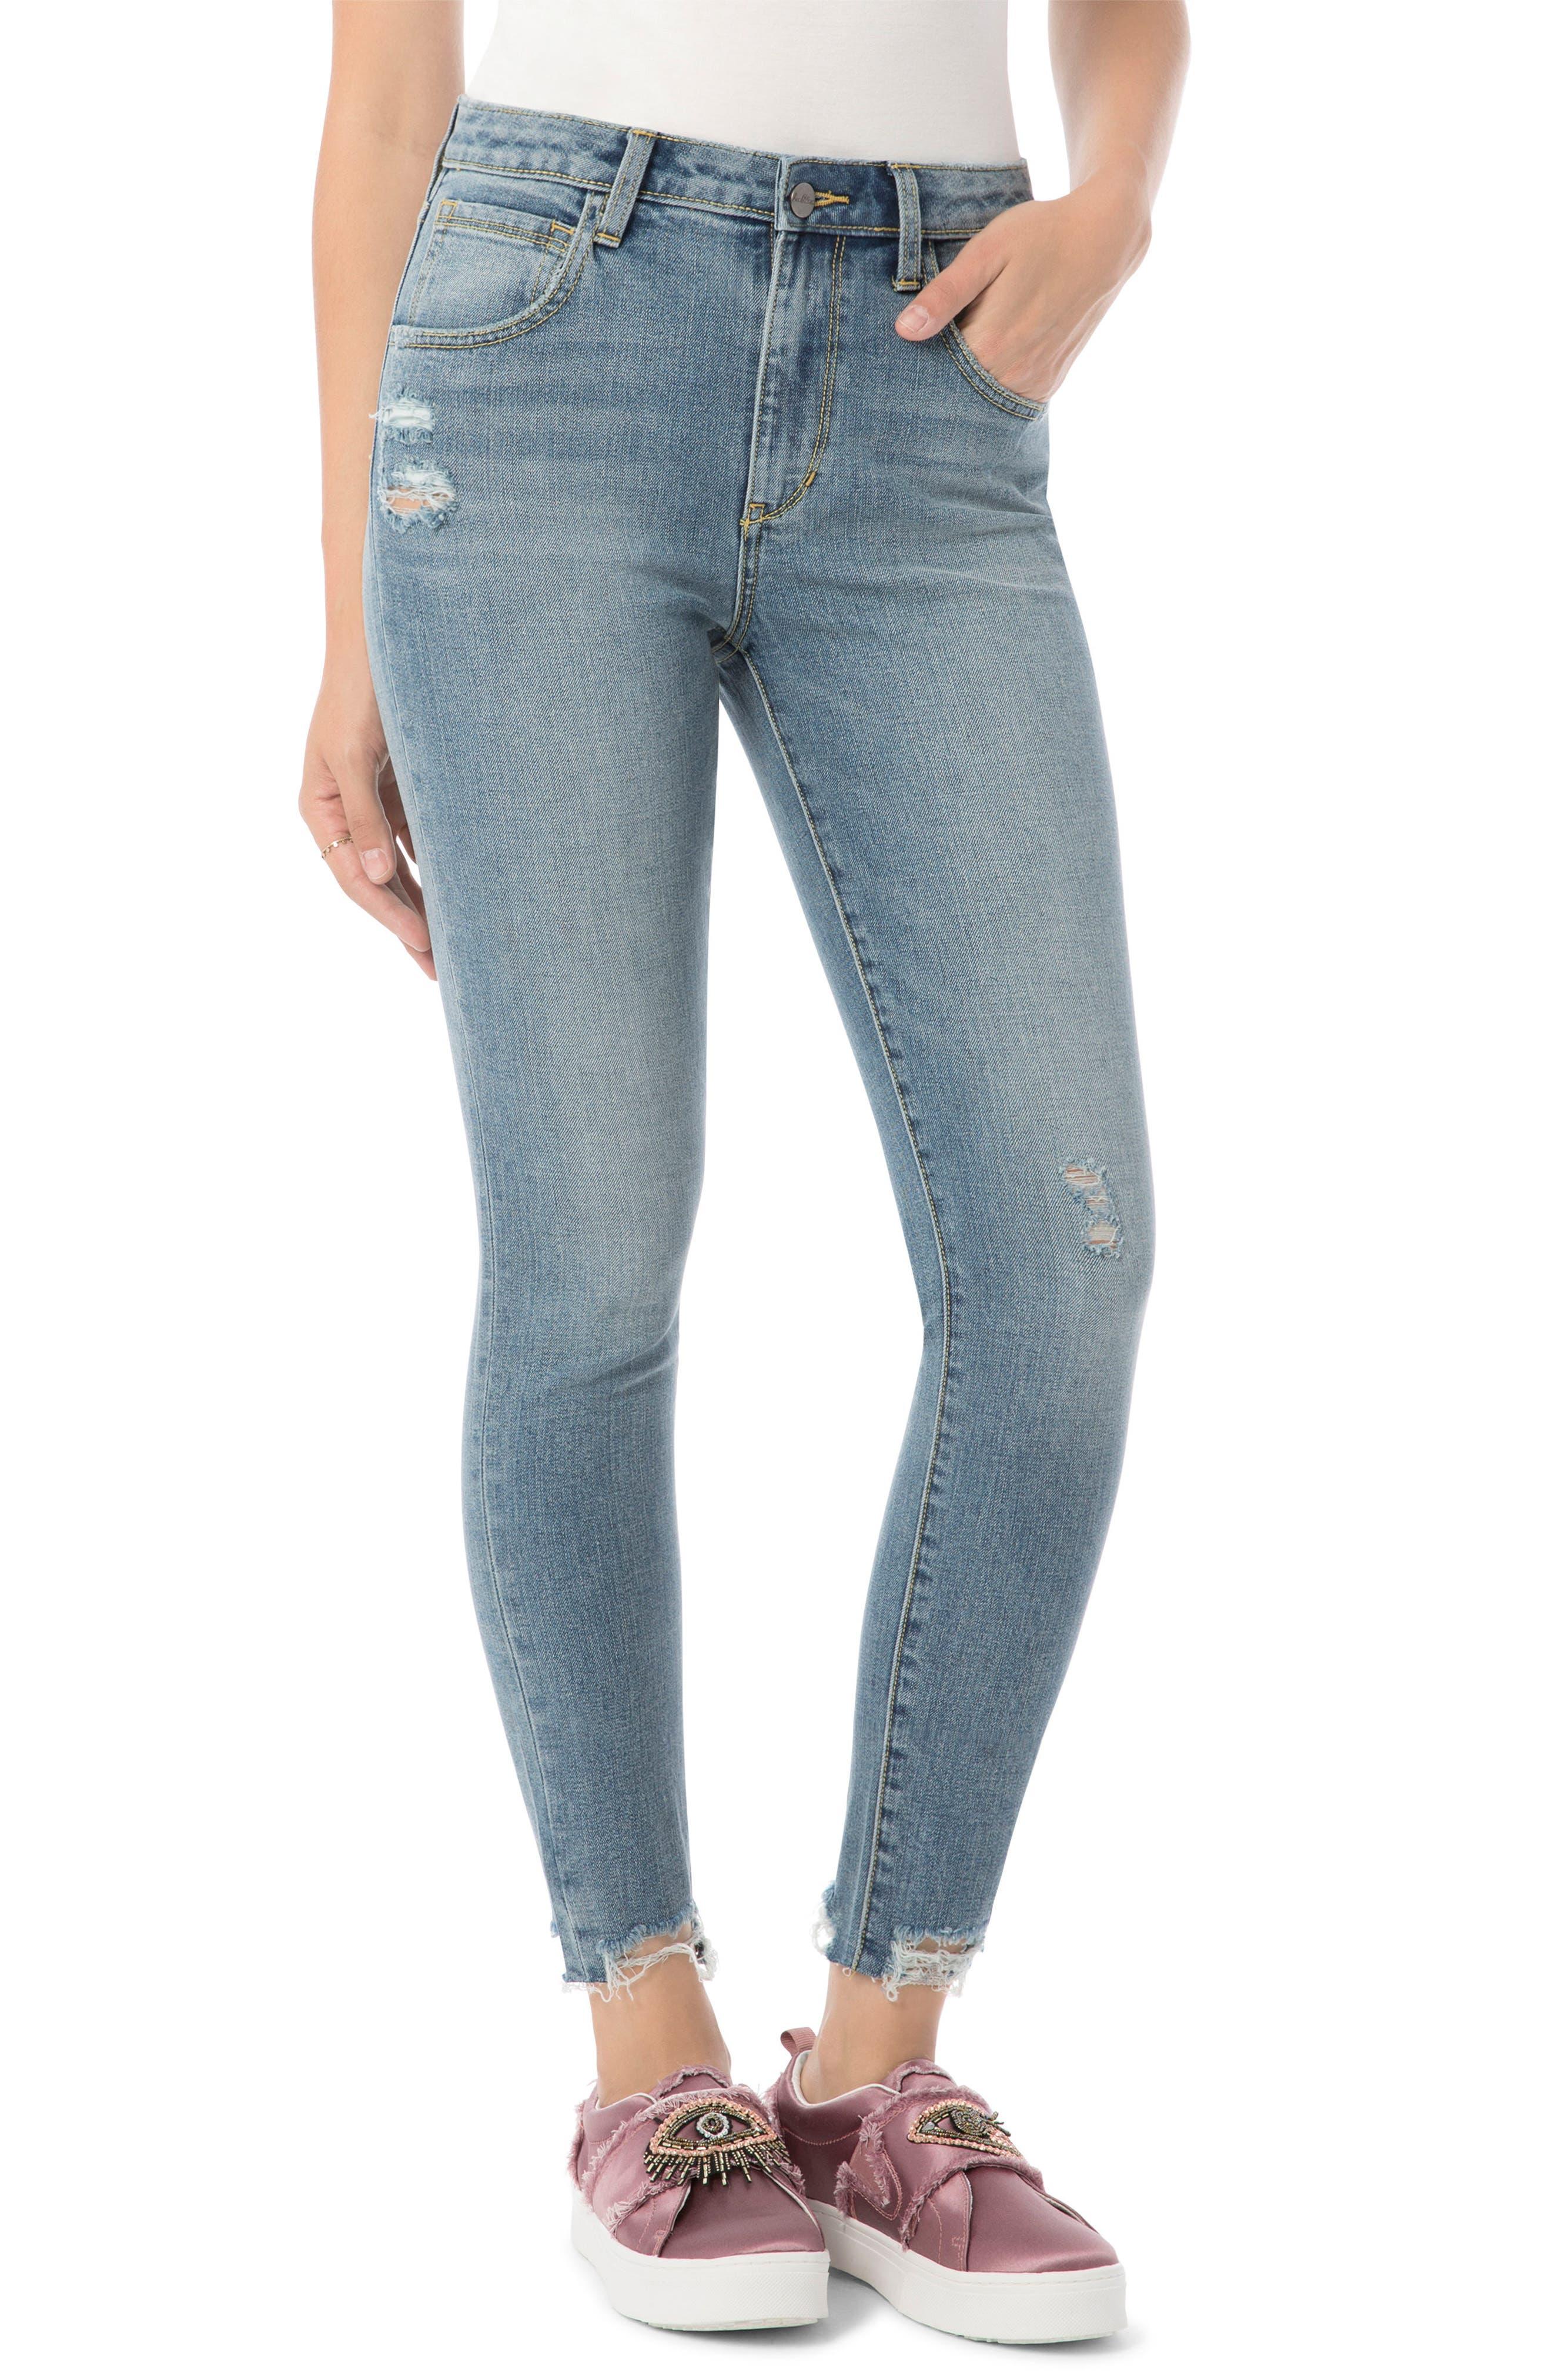 Alternate Image 1 Selected - Sam Edelman The Stilletto Skinny High-Waist Jeans (Ainsley)